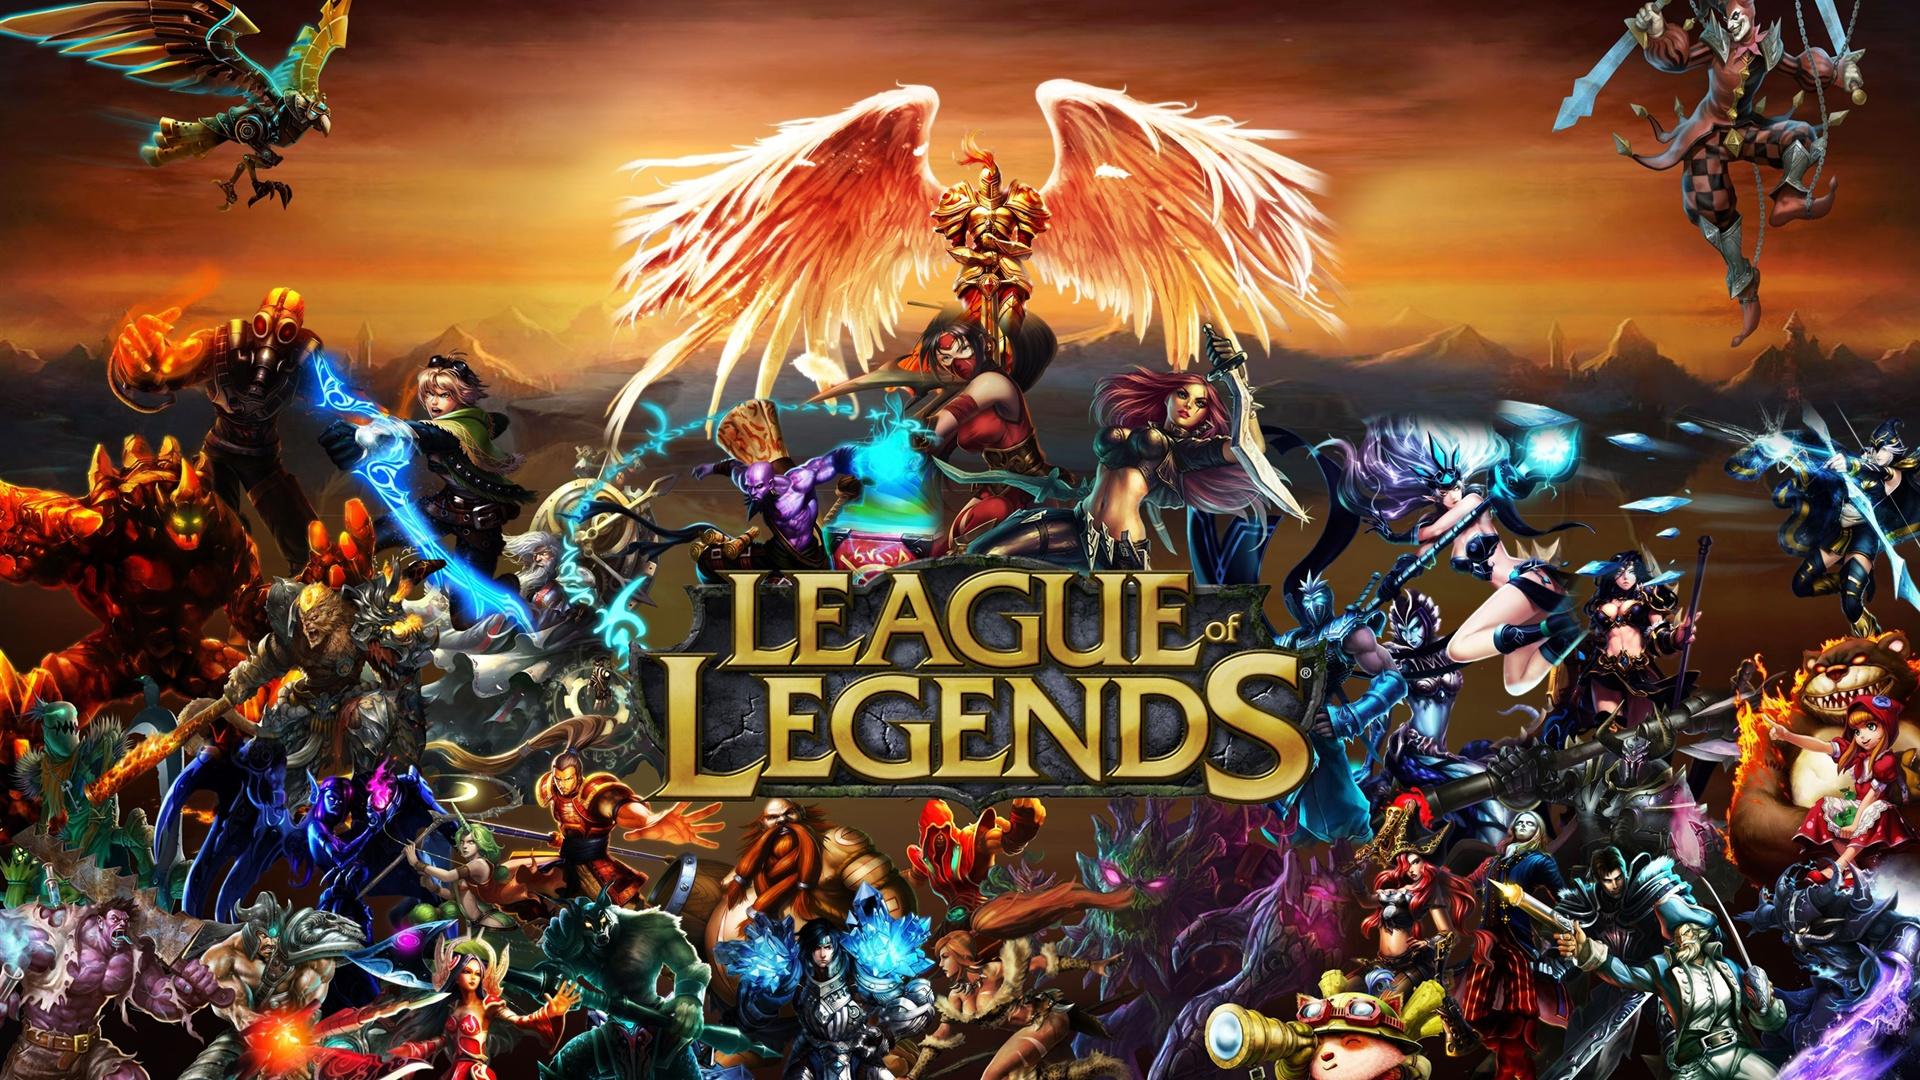 Pics photos pictures league of legends heroes wallpaper hd 1080p jpg - Kiwig8a League Of Legends Wallpapers Hd 1080p 1